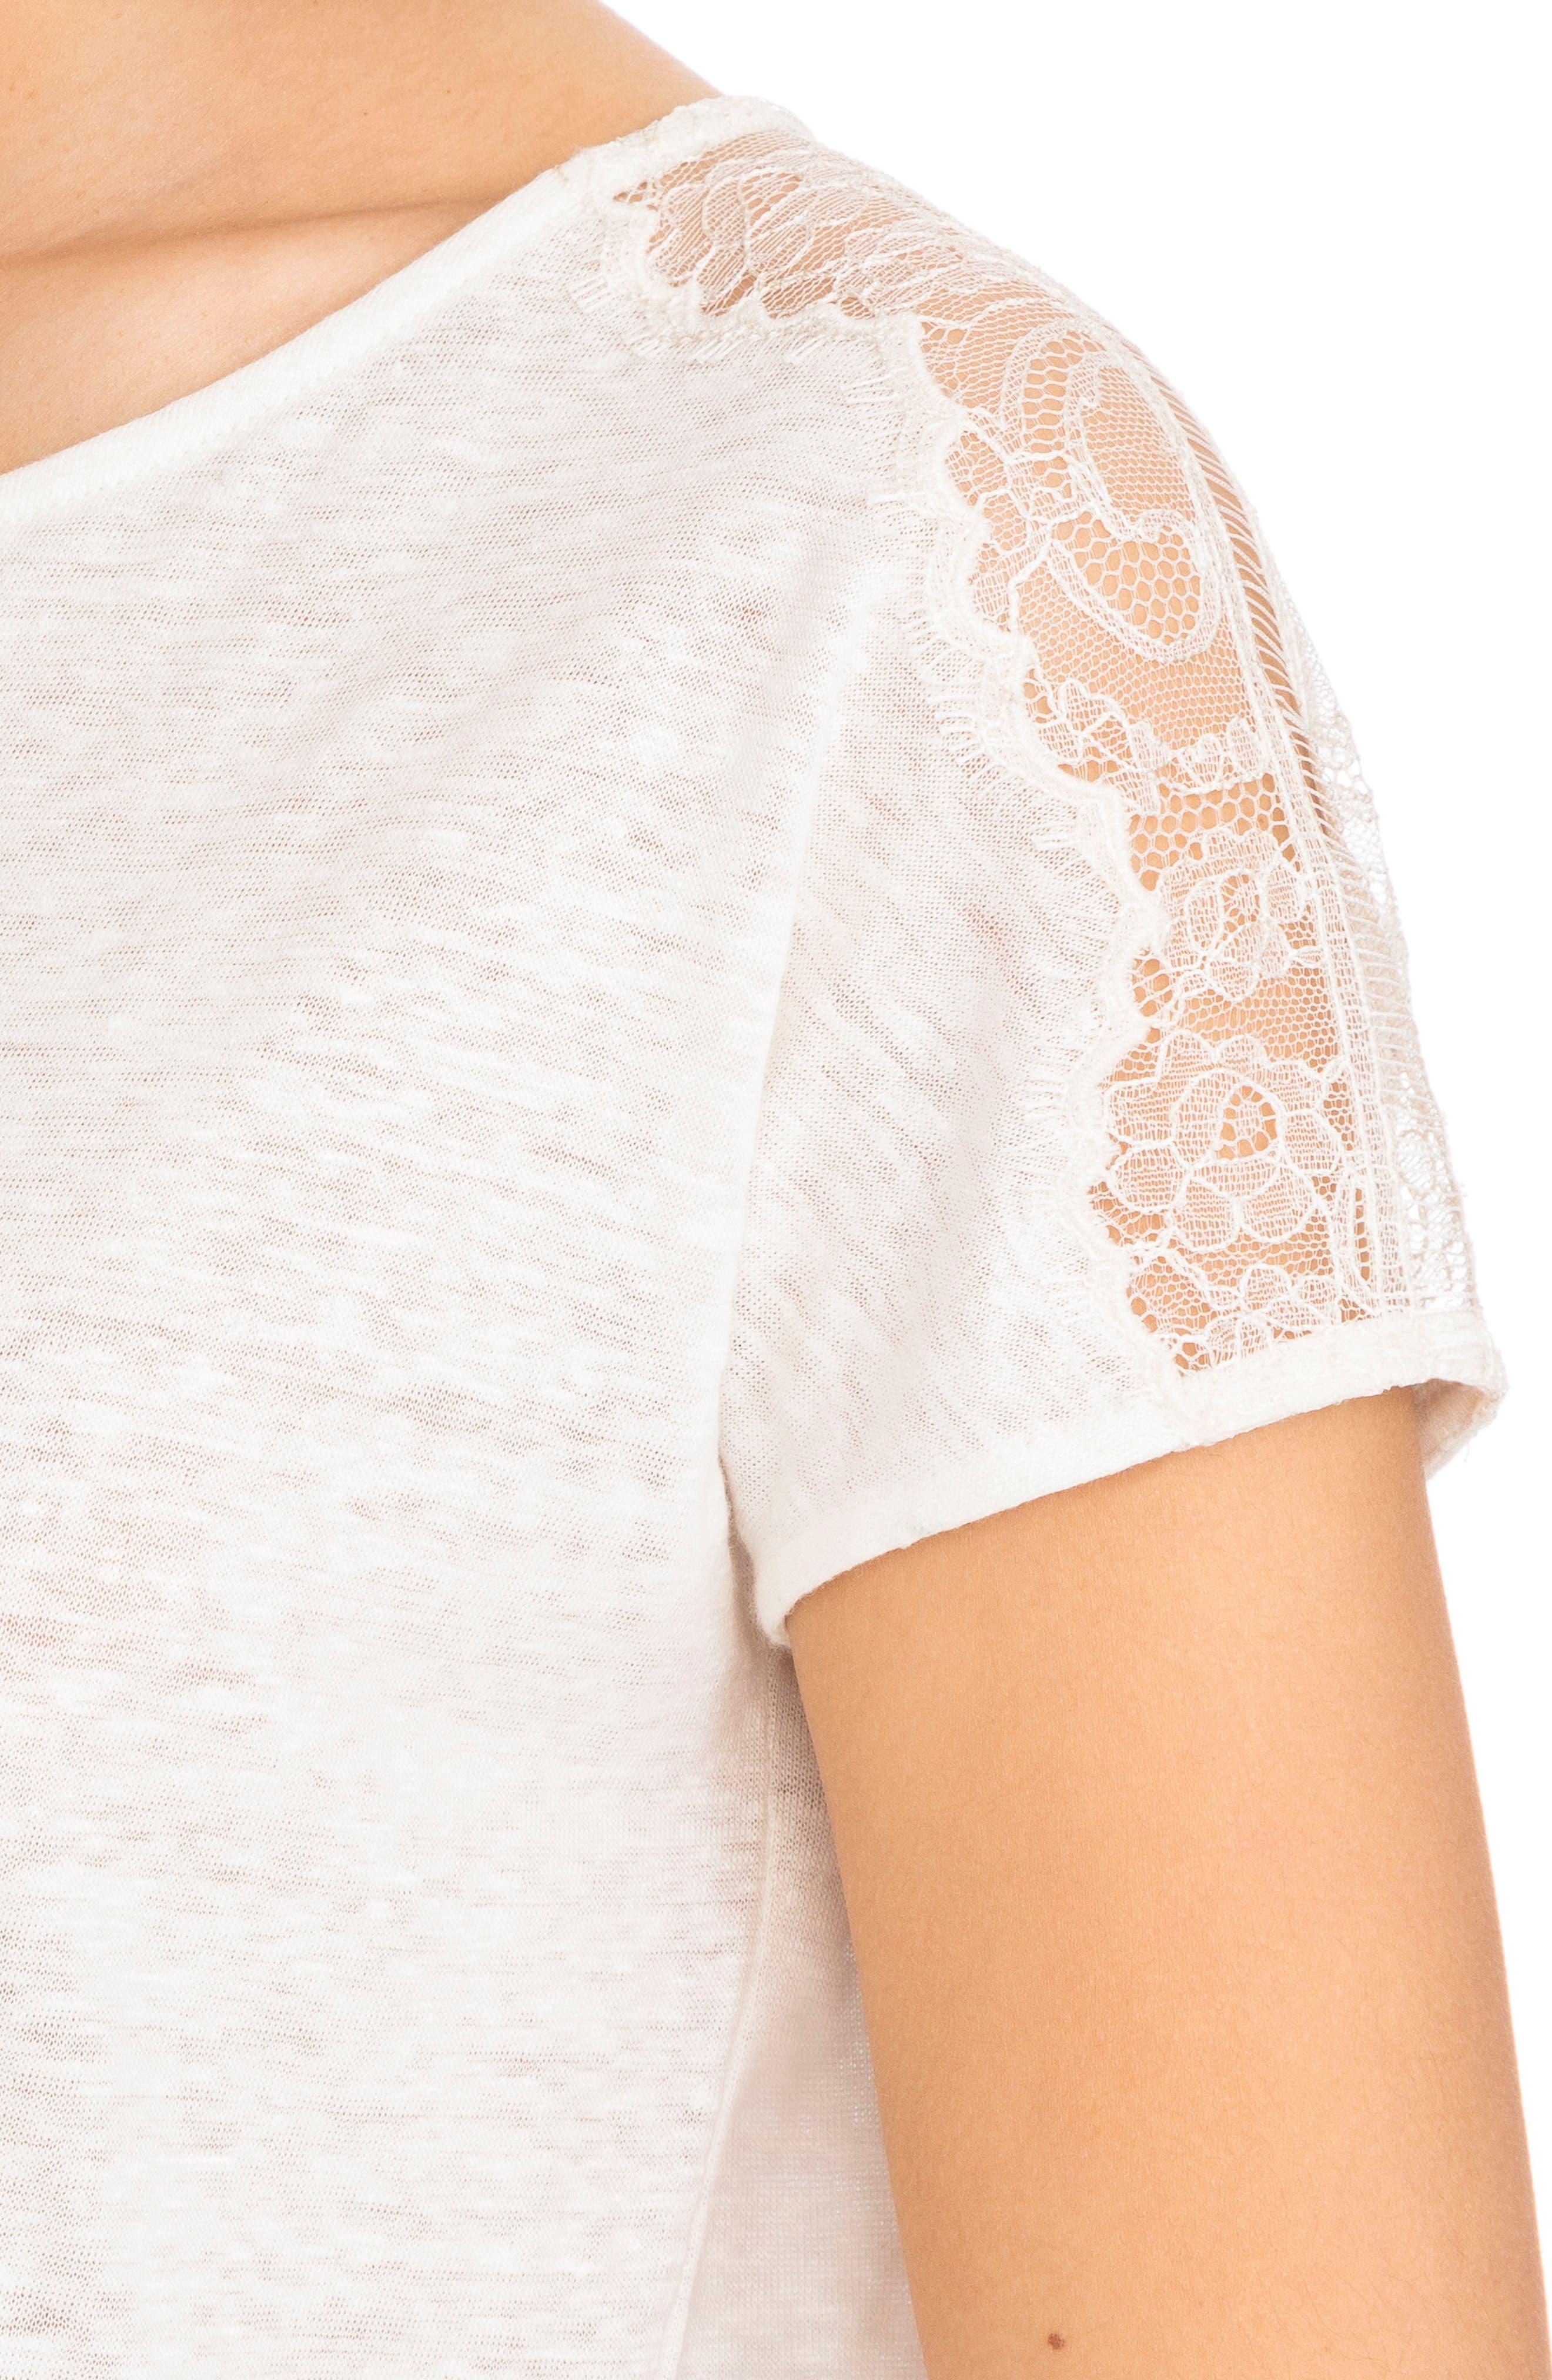 Livia Lace Shoulder Back Tie Linen Tee,                             Alternate thumbnail 5, color,                             Off White